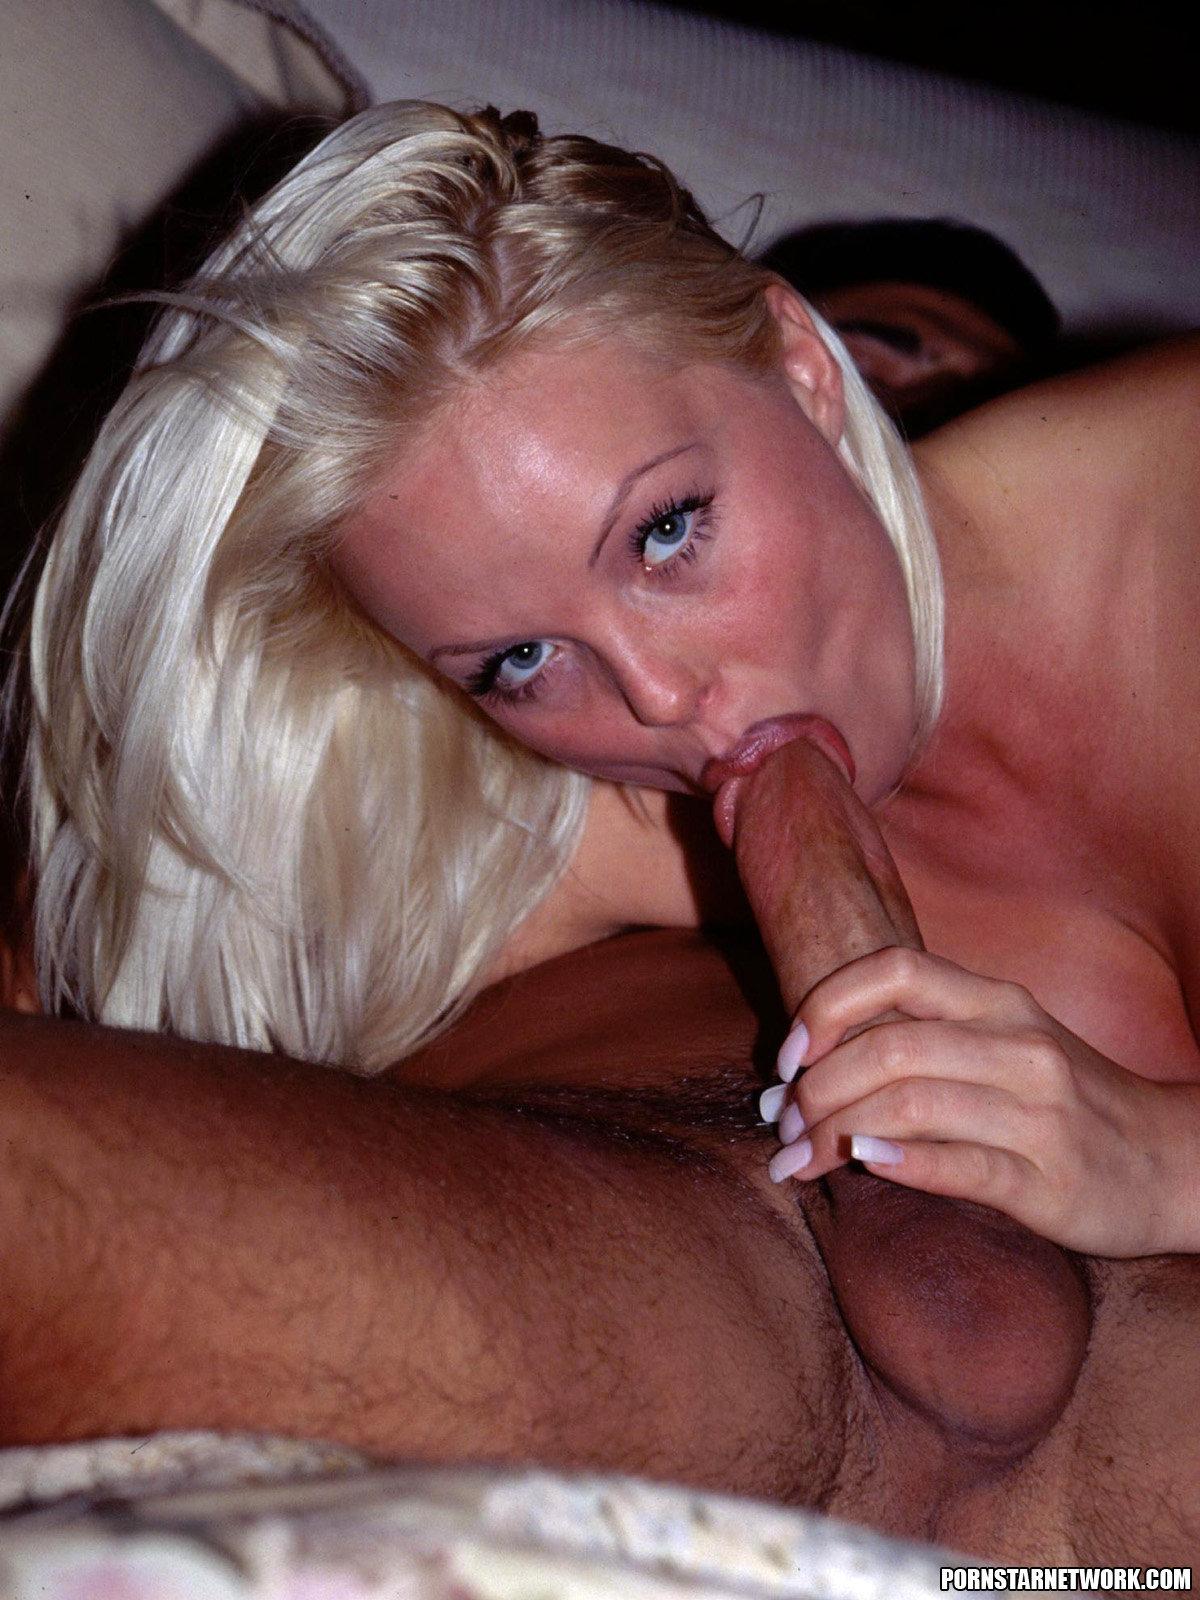 American Mary (2012) Nude Scenes